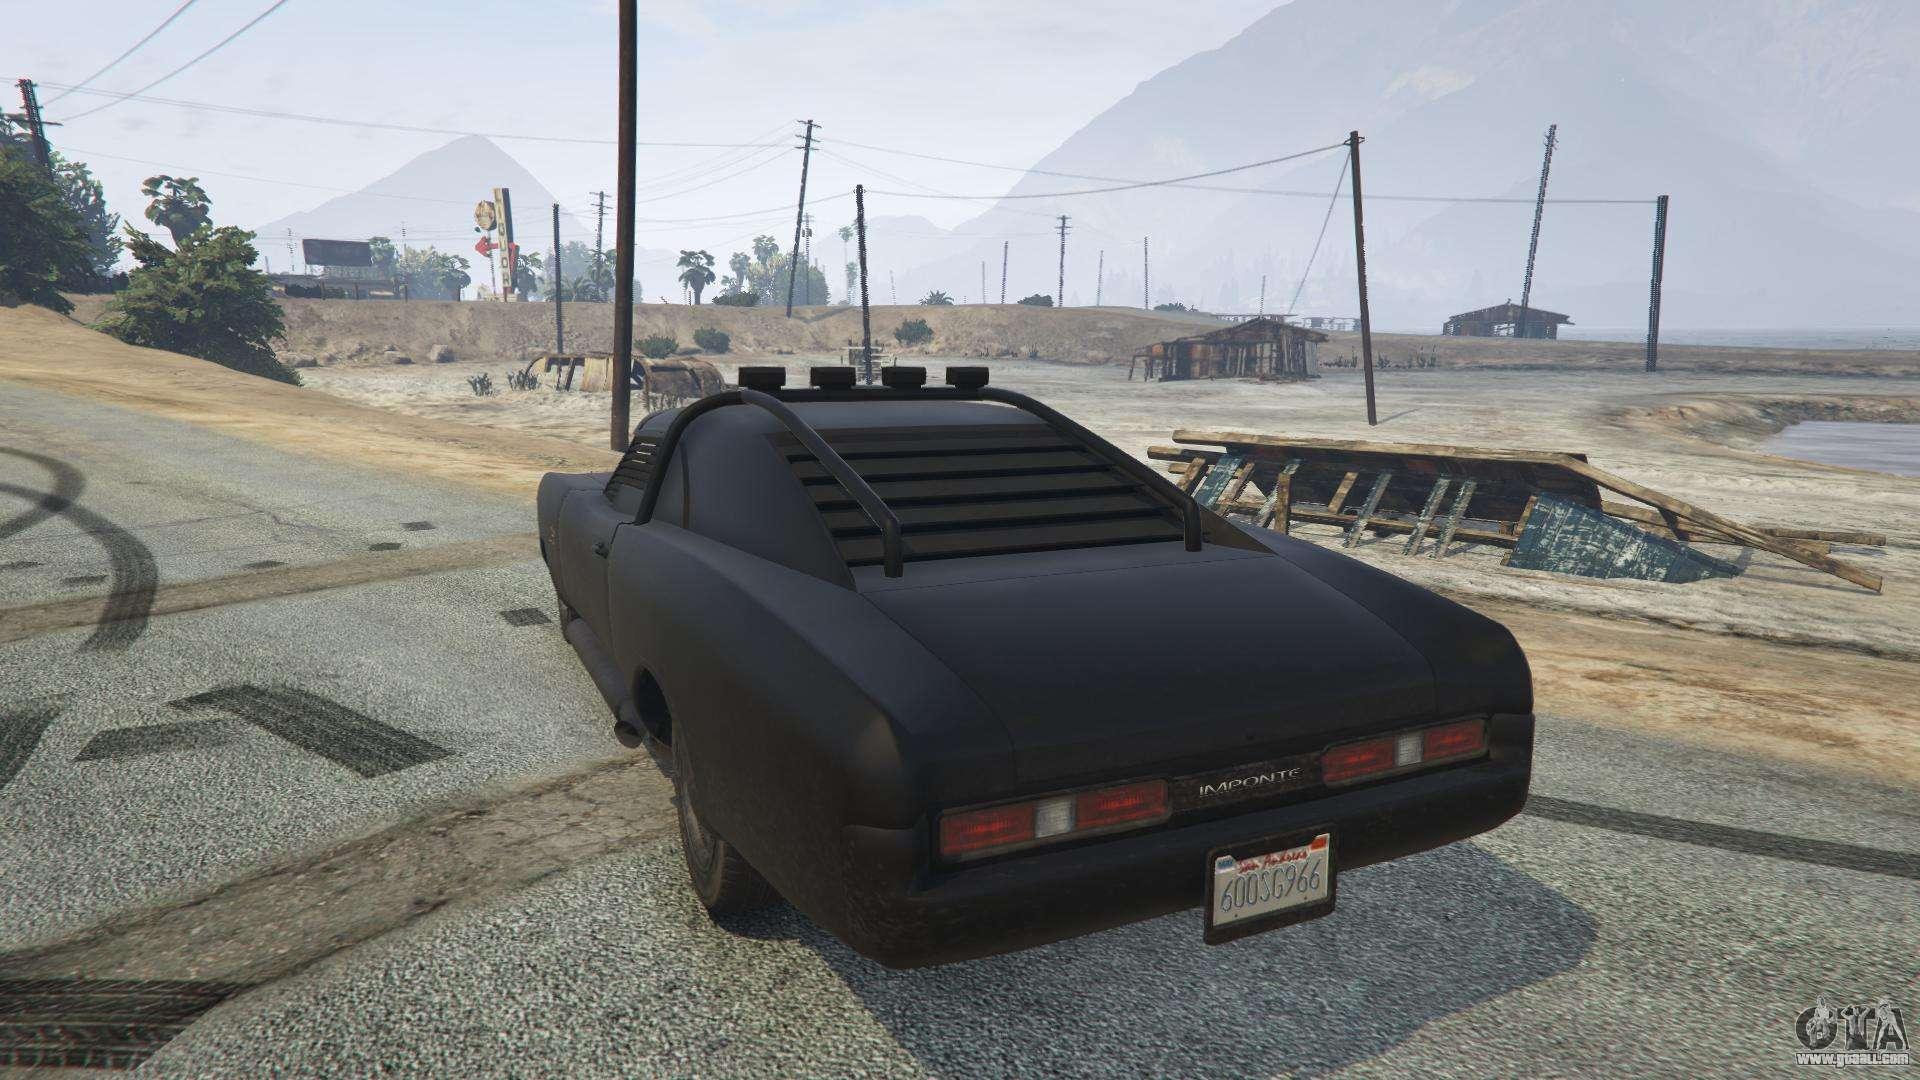 Duke O Death From Gta Screenshots Features And Description